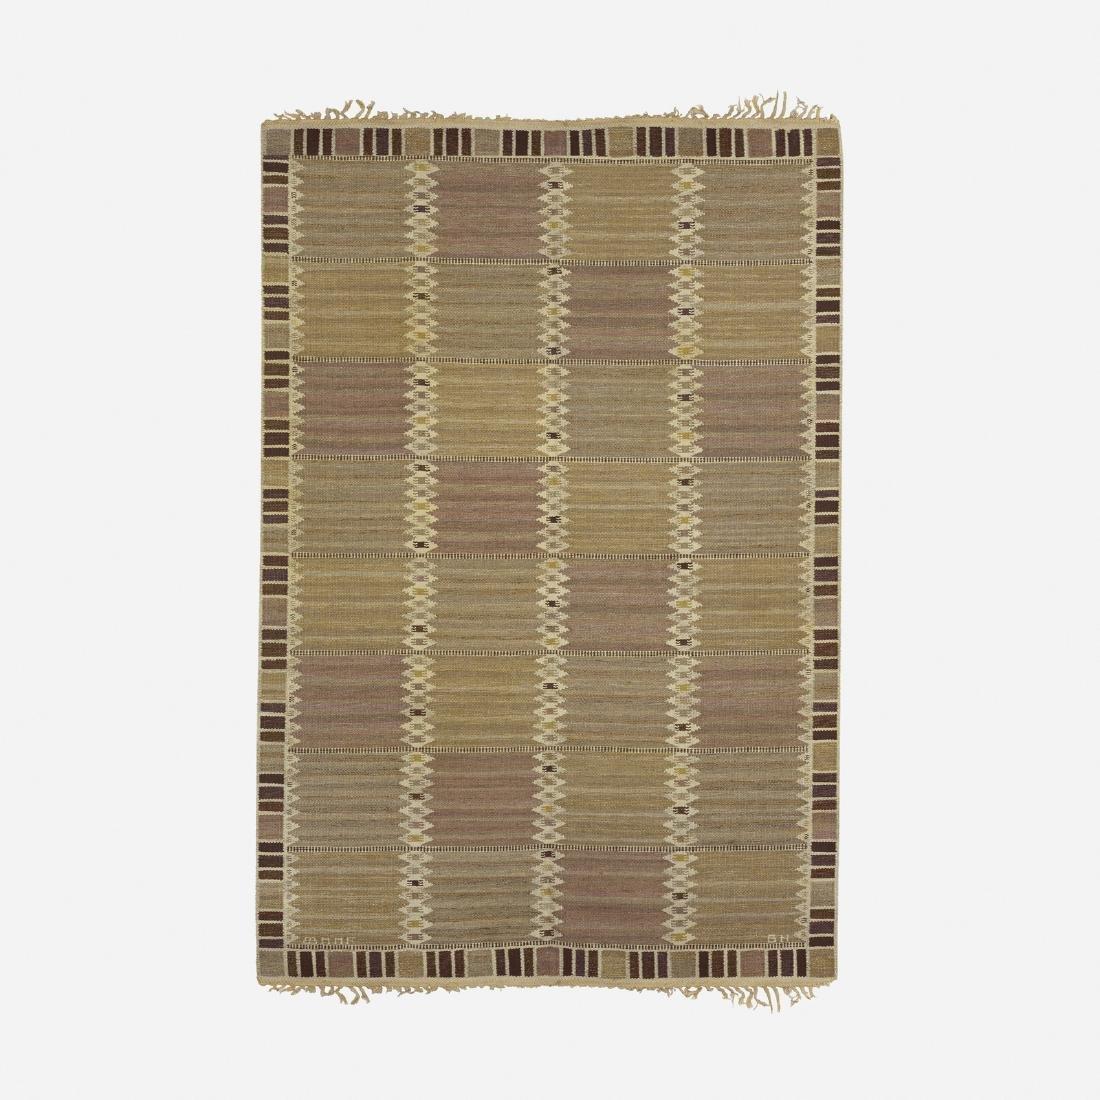 Barbro Nilsson, Salerno enkel flatweave carpet